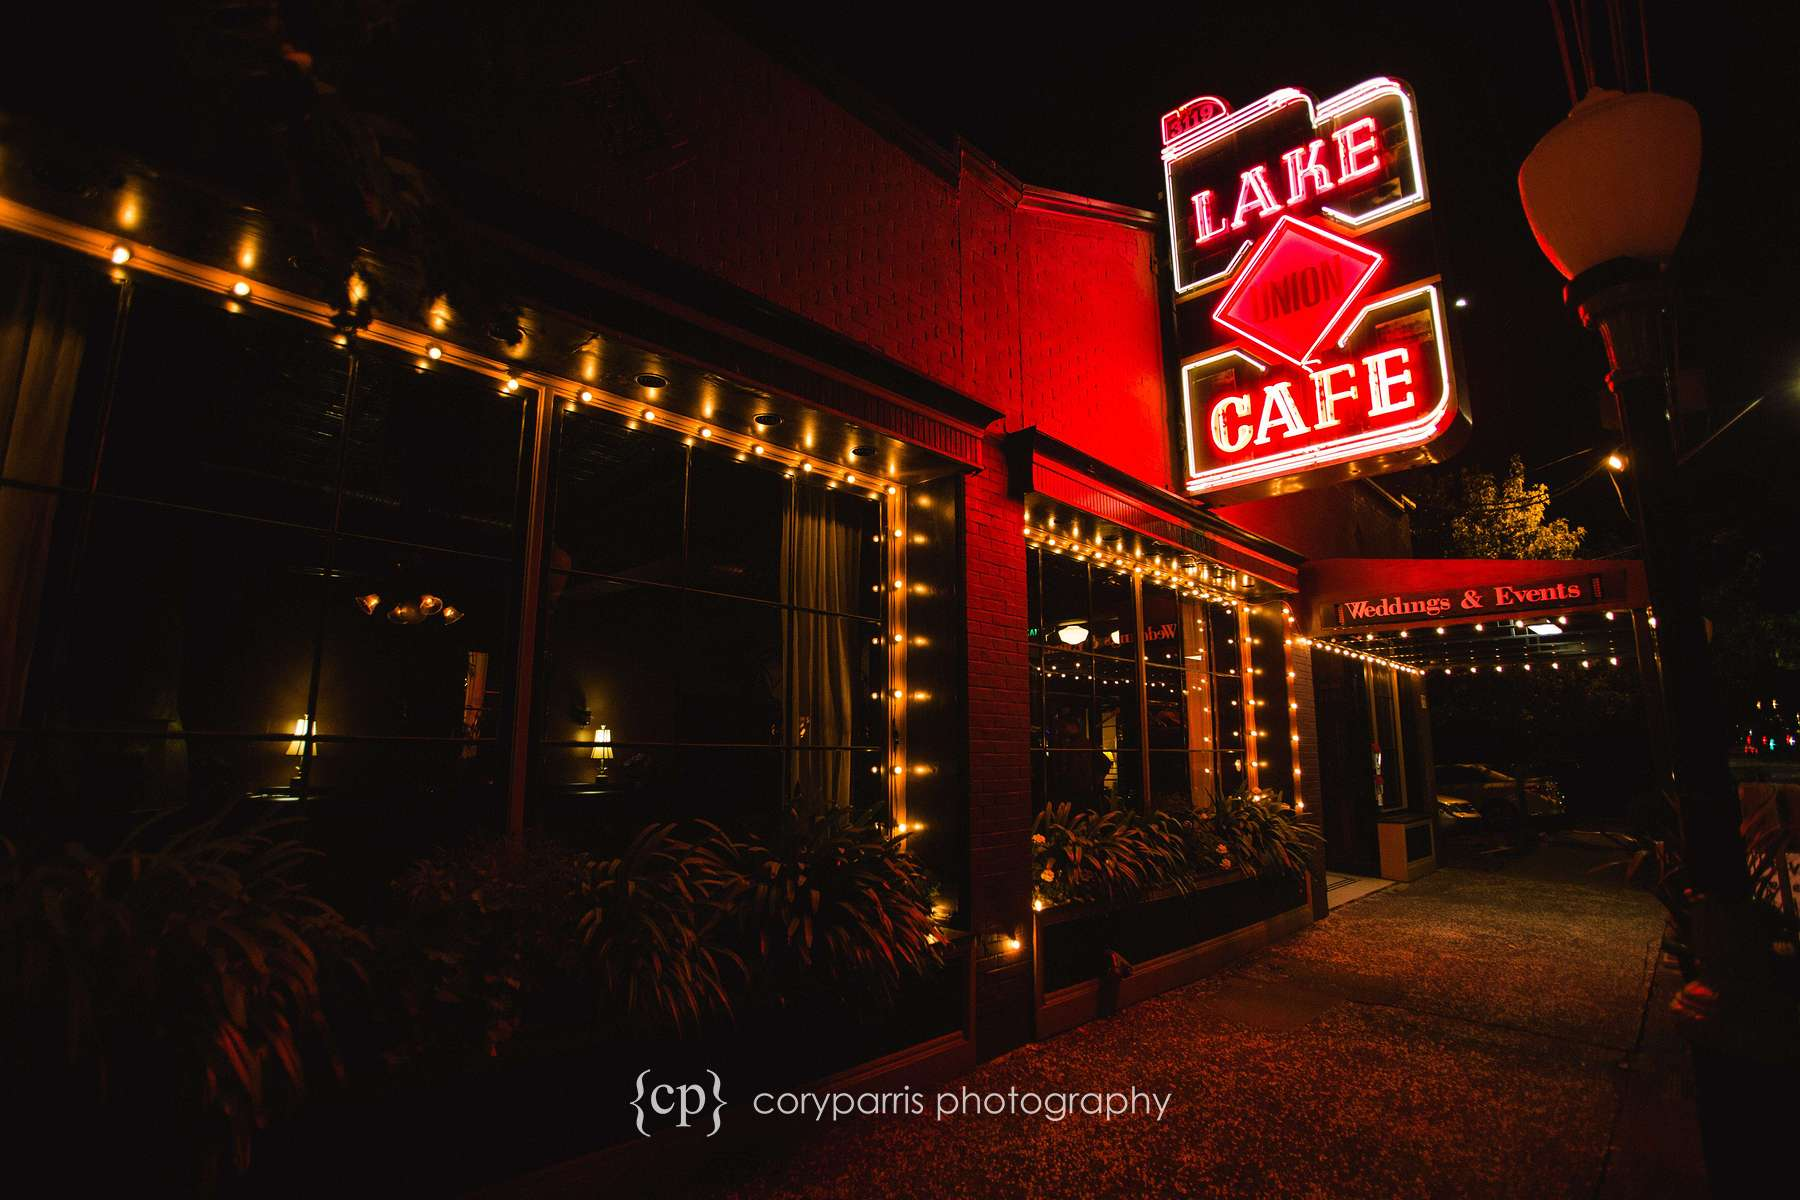 Lake Union Cafe wedding venue in Seattle